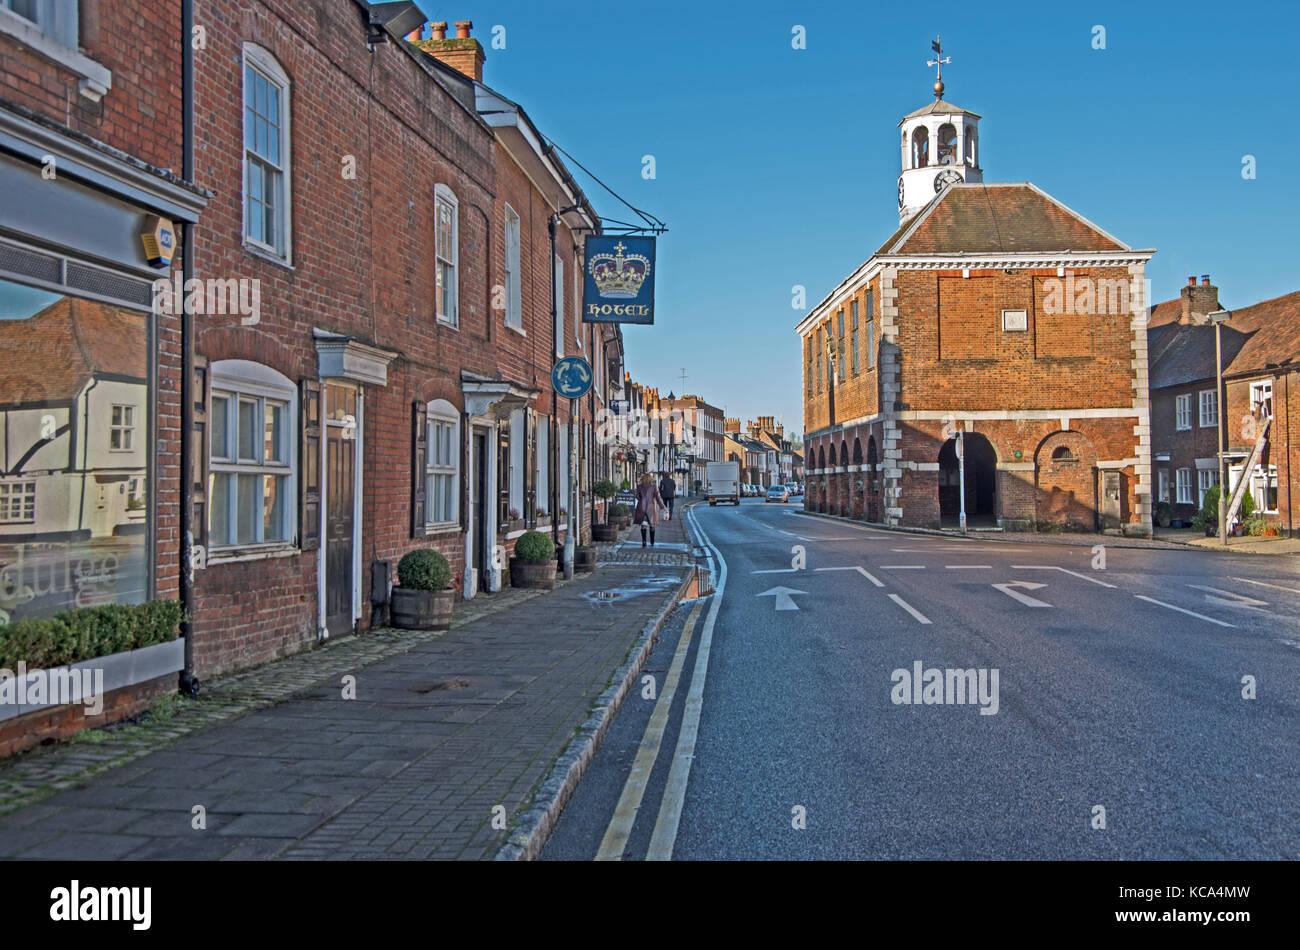 Amersham, Chilterns, Buckinghamshire, Market Hall, High Street, - Stock Image